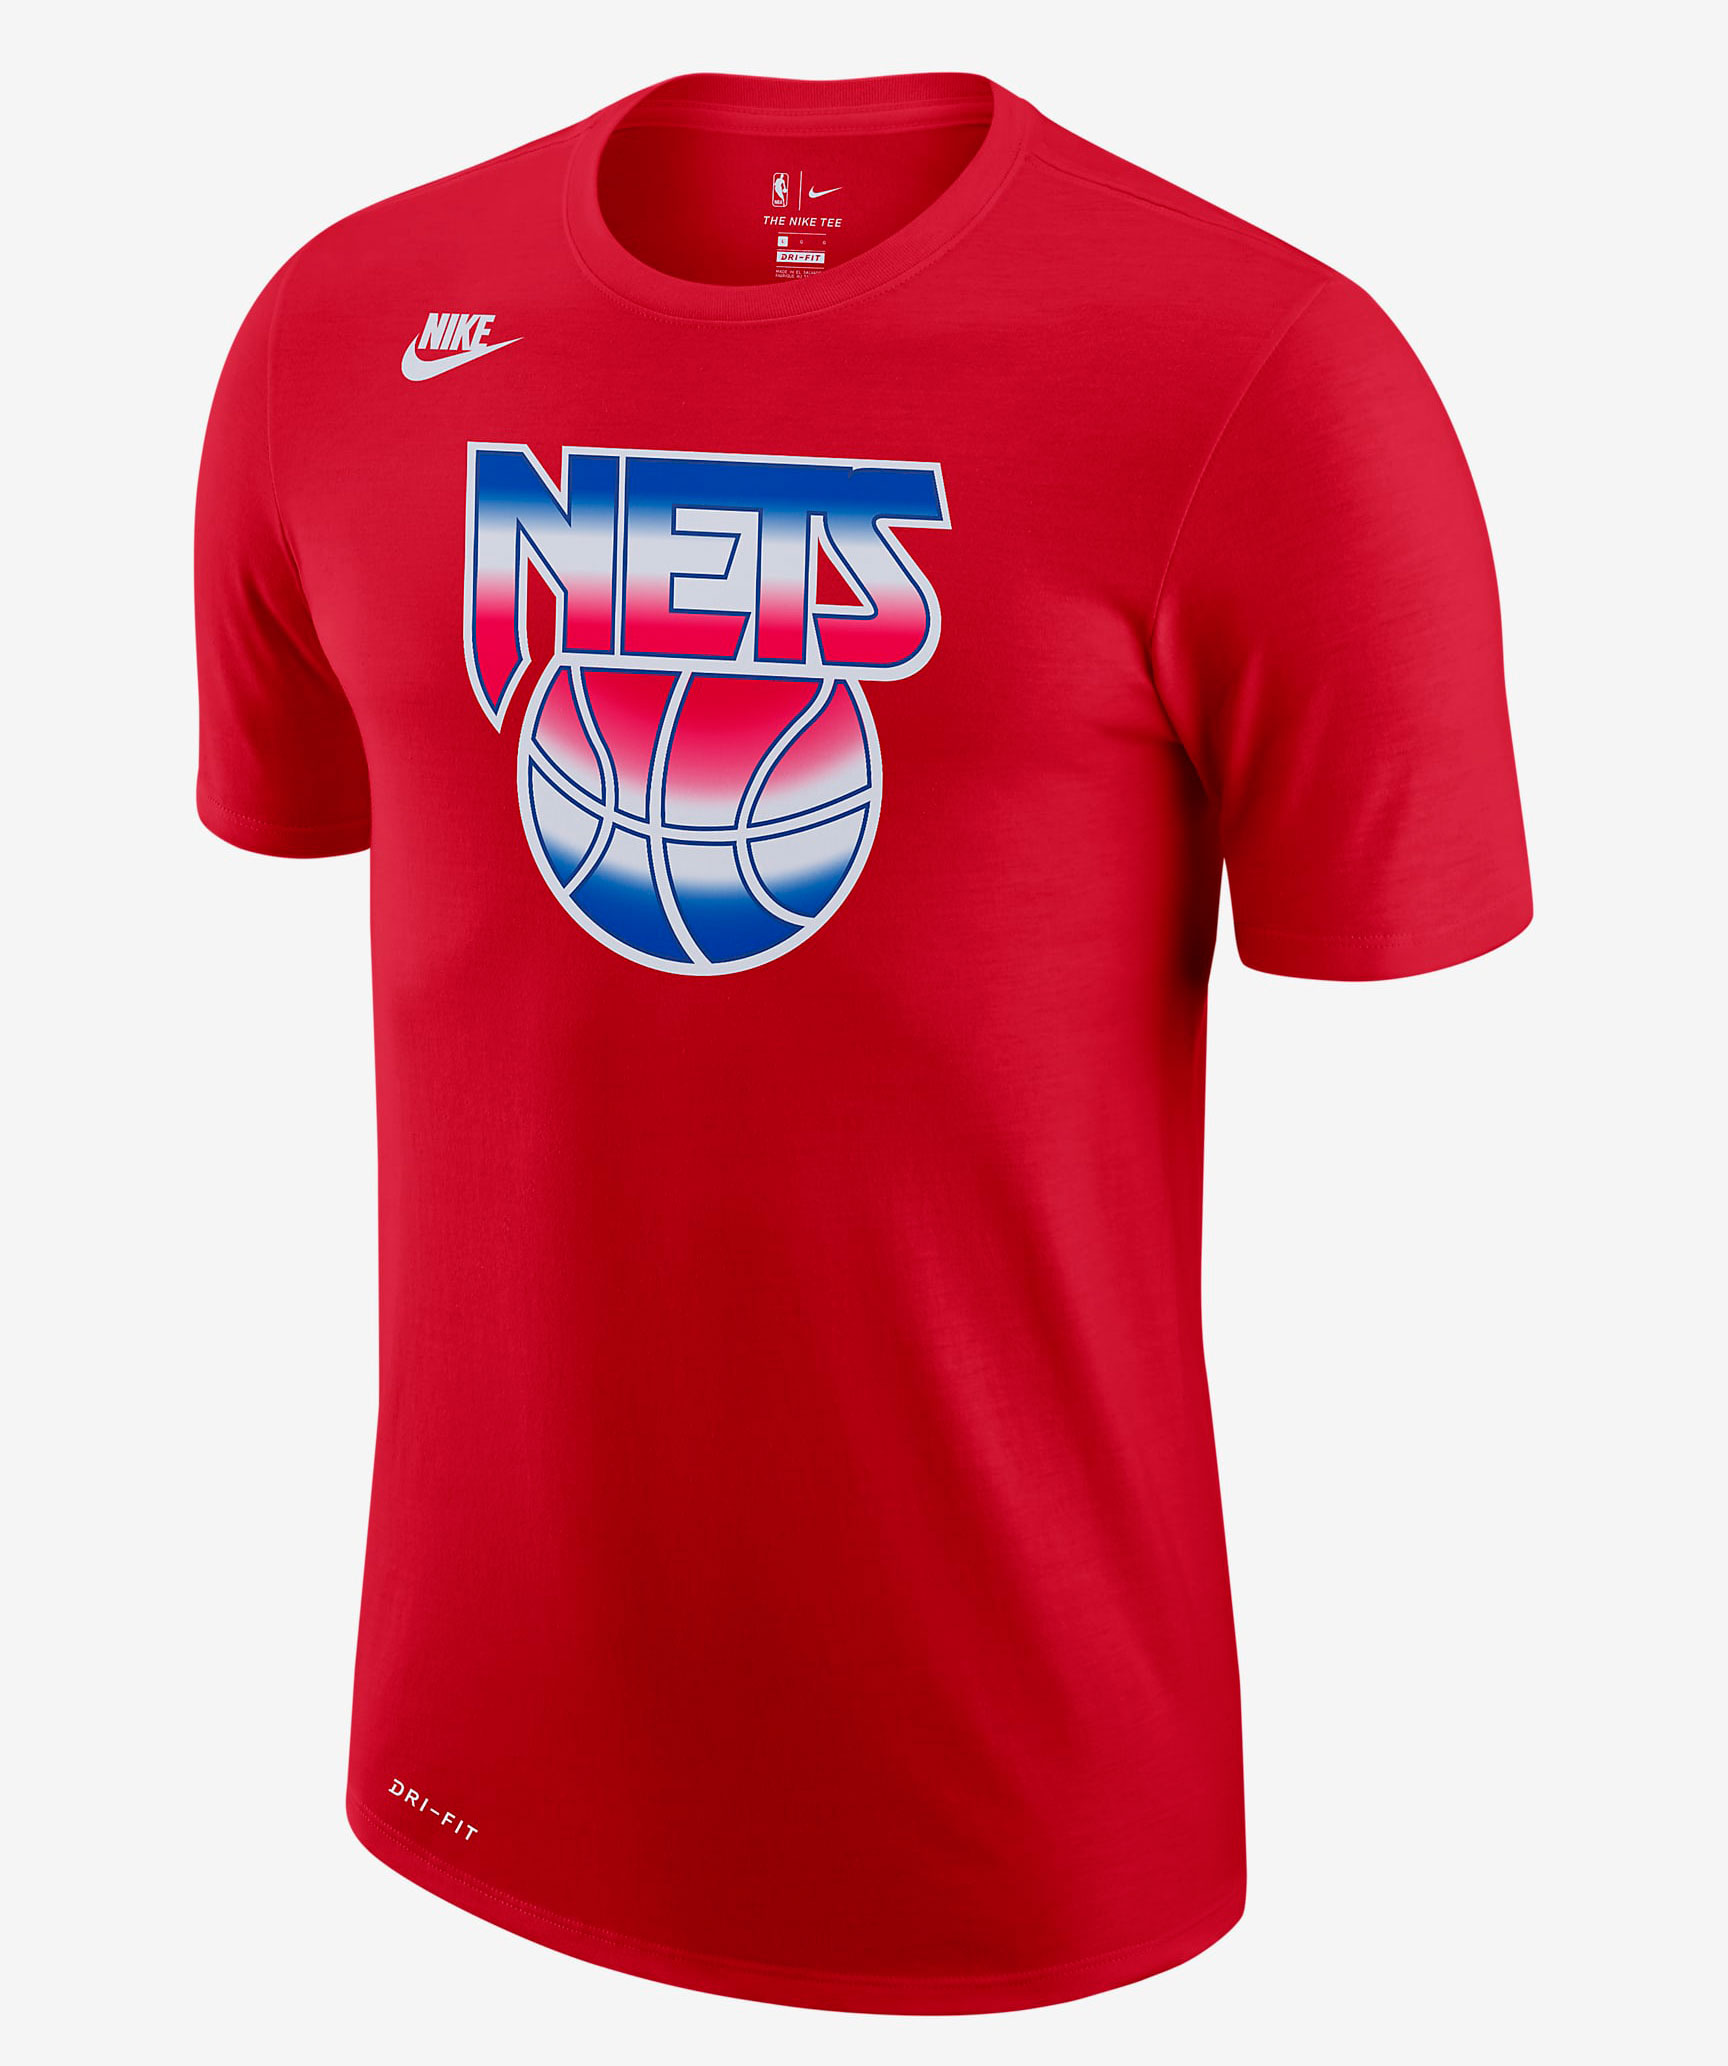 nike-brooklyn-nets-classic-edition-red-retro-shirt